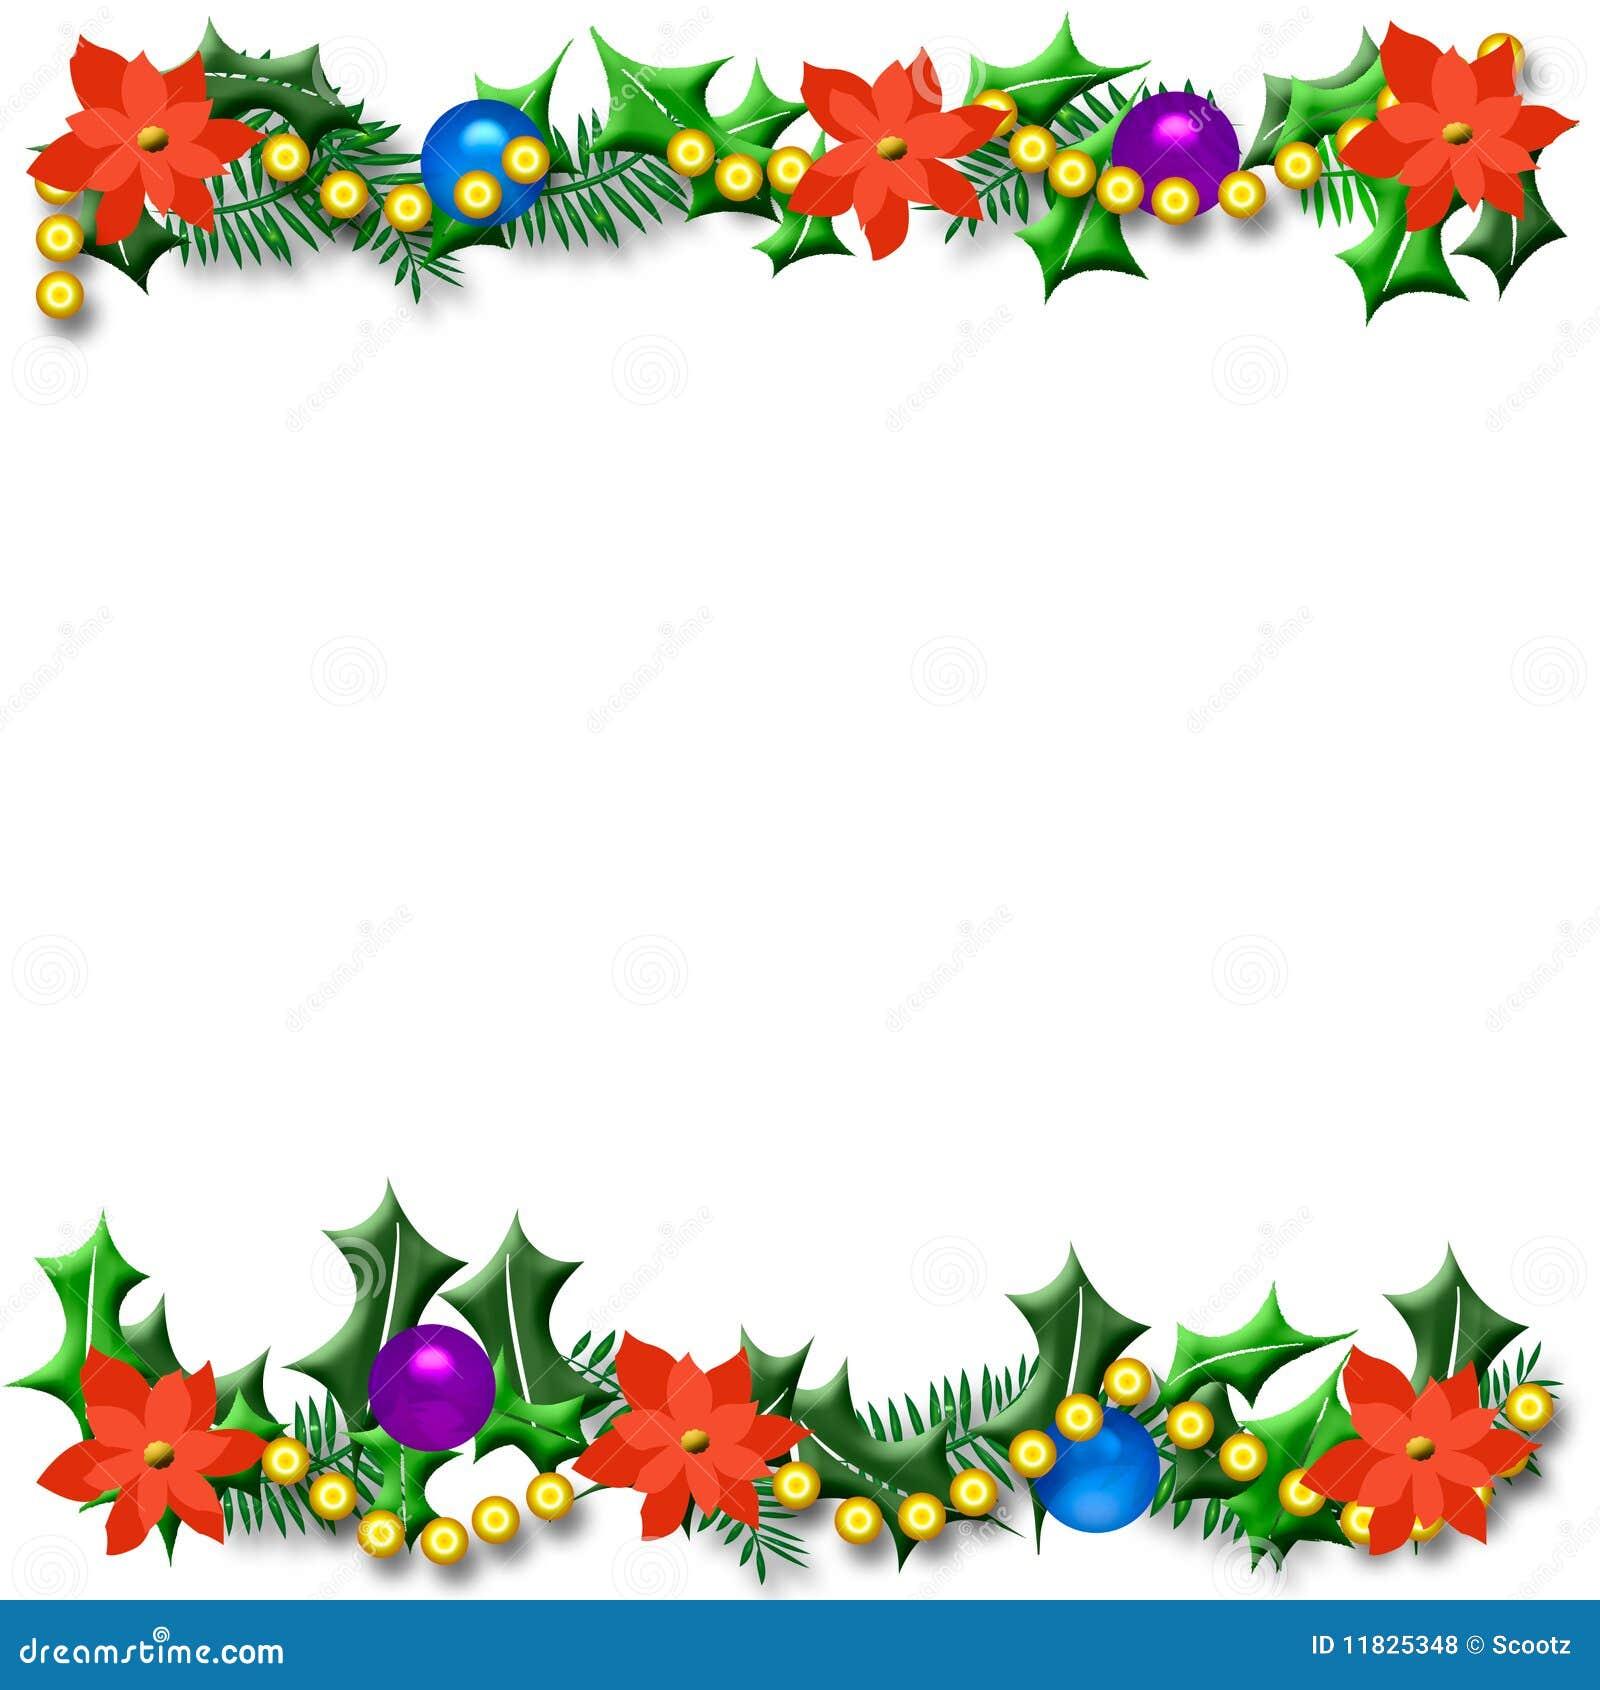 Poinsettia frames new calendar template site for Poinsettia christmas tree frame